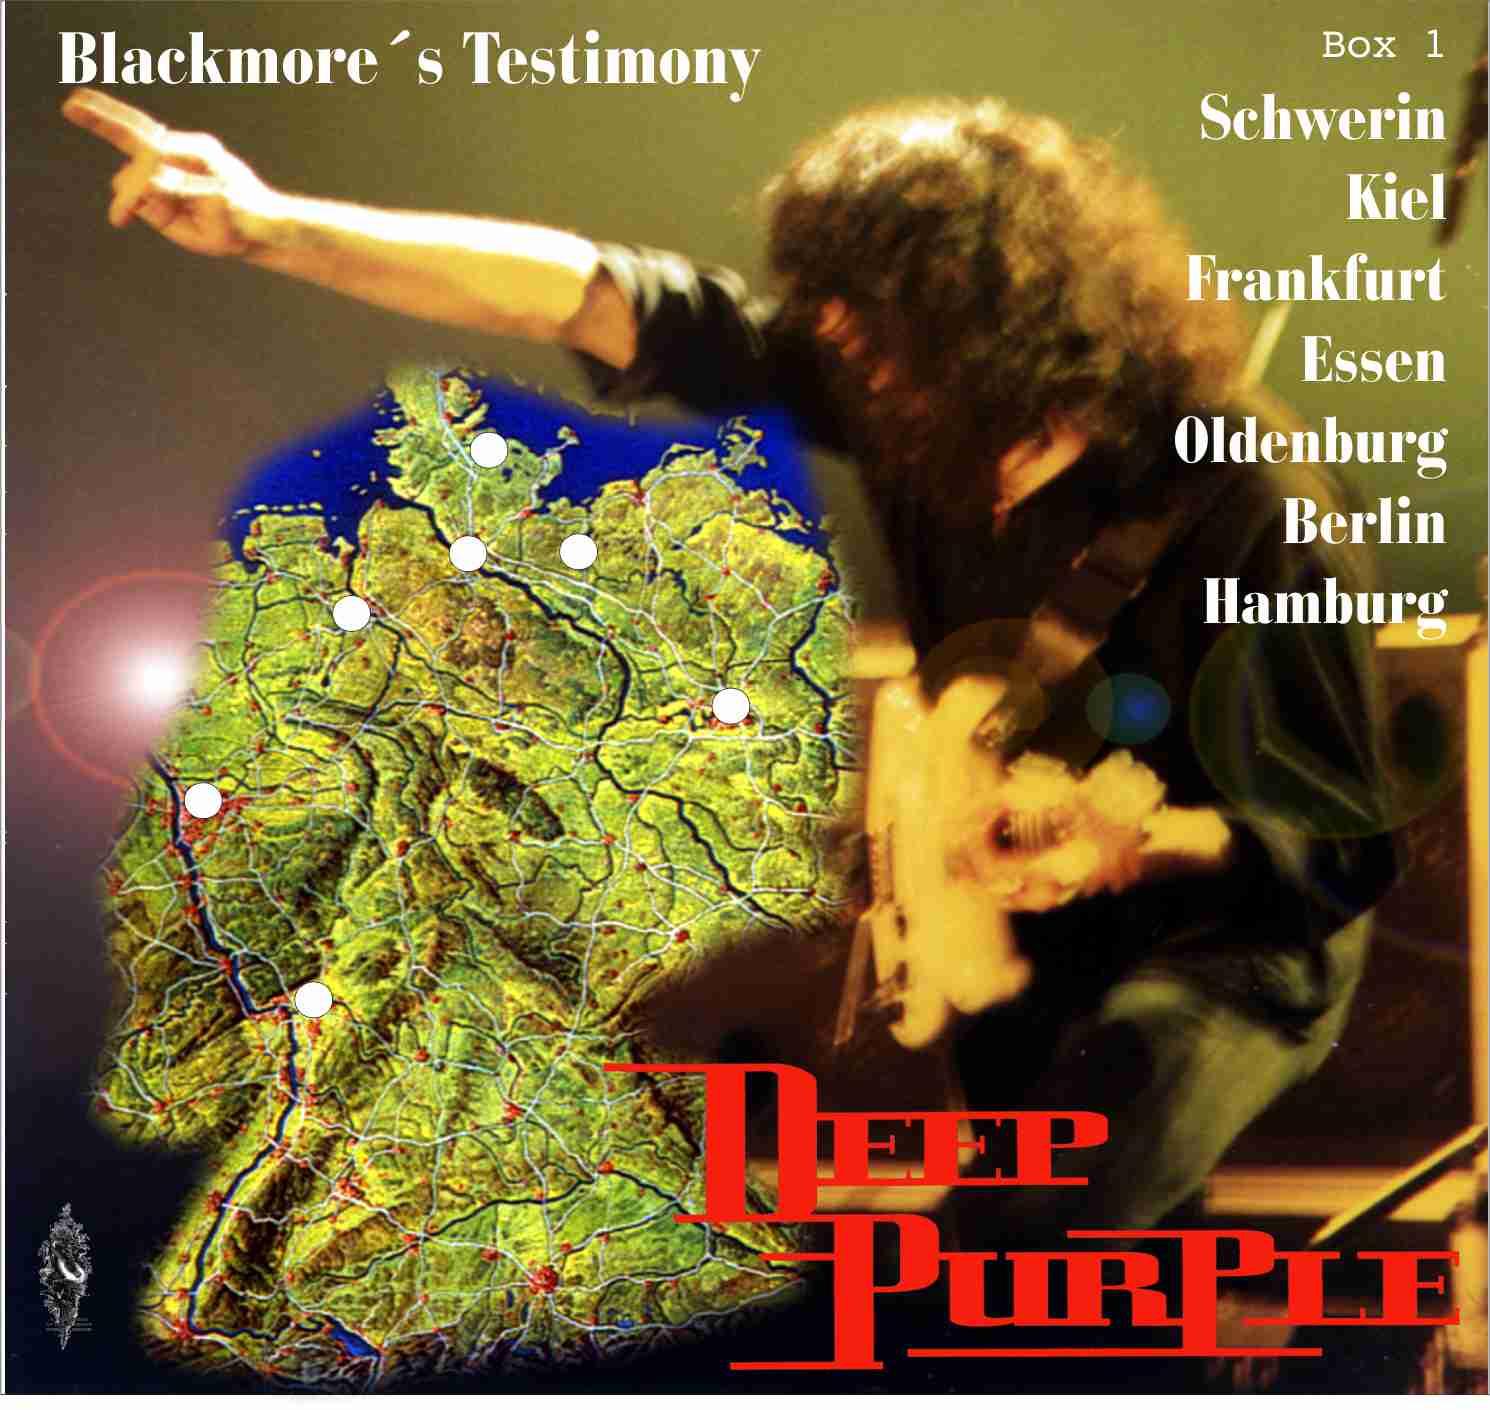 HEAVY ROCK BOOTLEGS Deep Purple 1993 Entire German Tour Blackmore